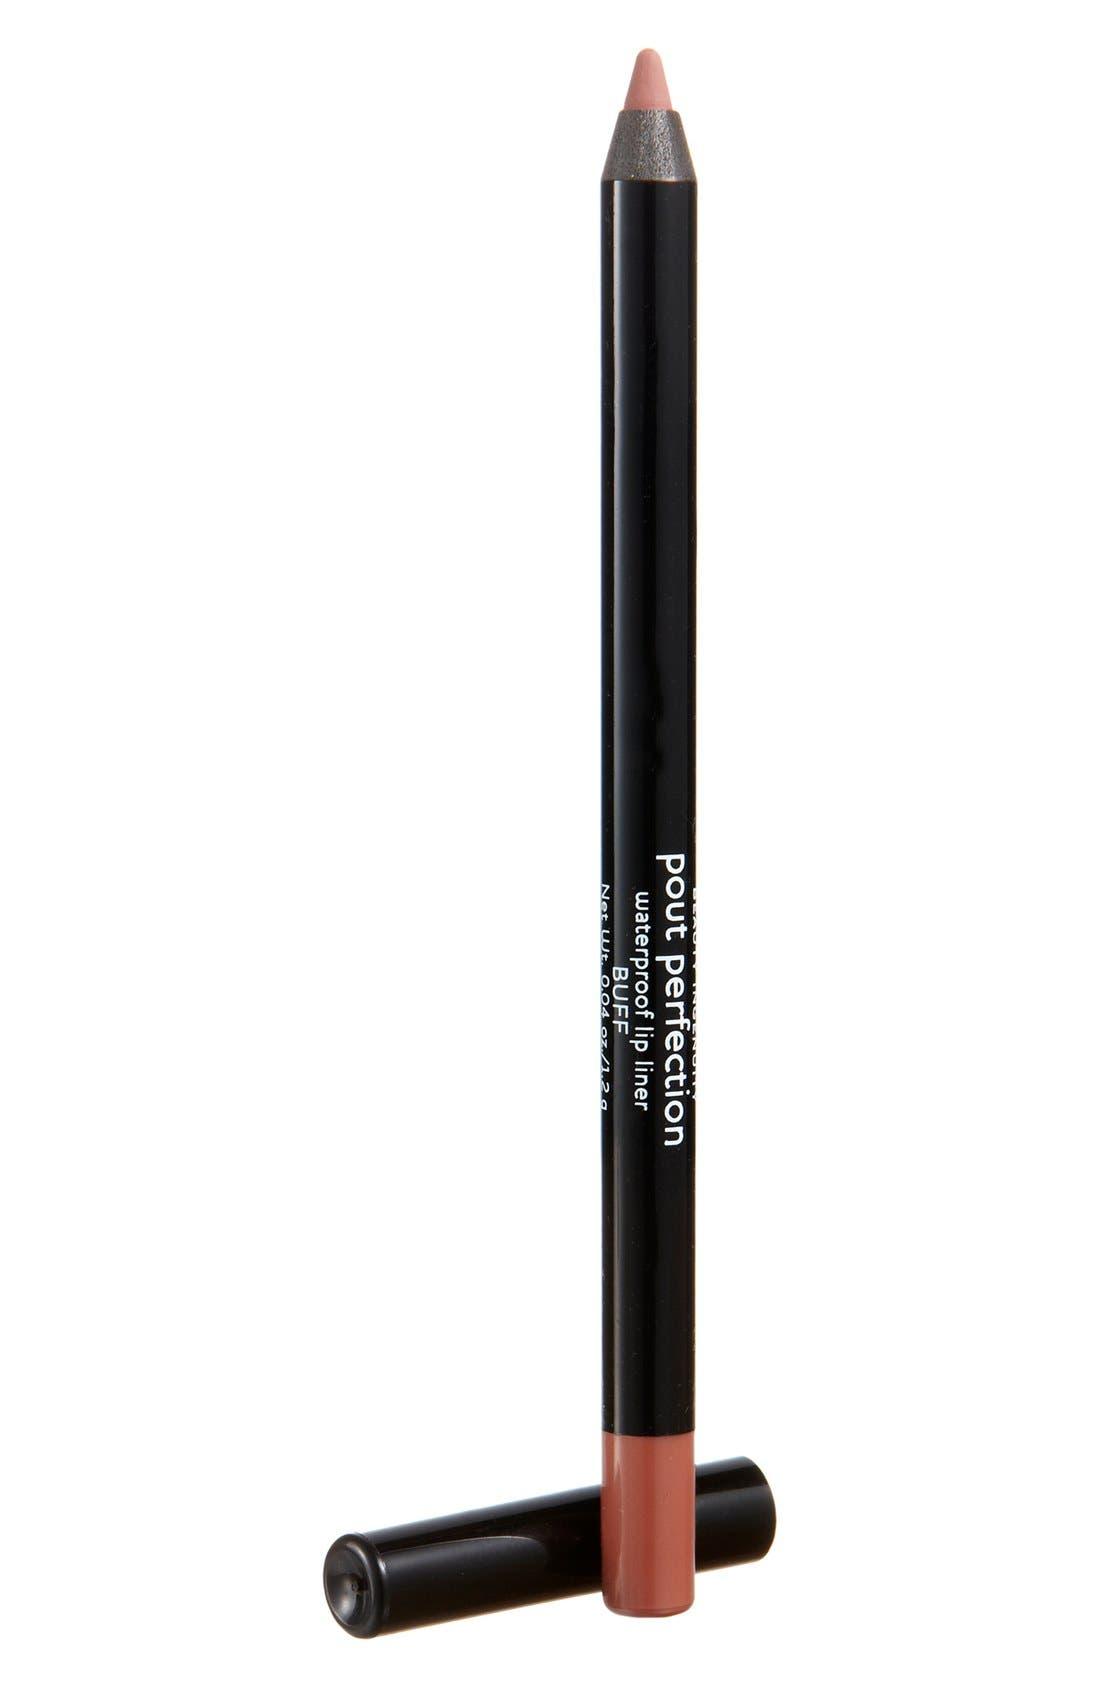 Laura Geller Beauty 'Pout Perfection' Waterproof Lip Liner